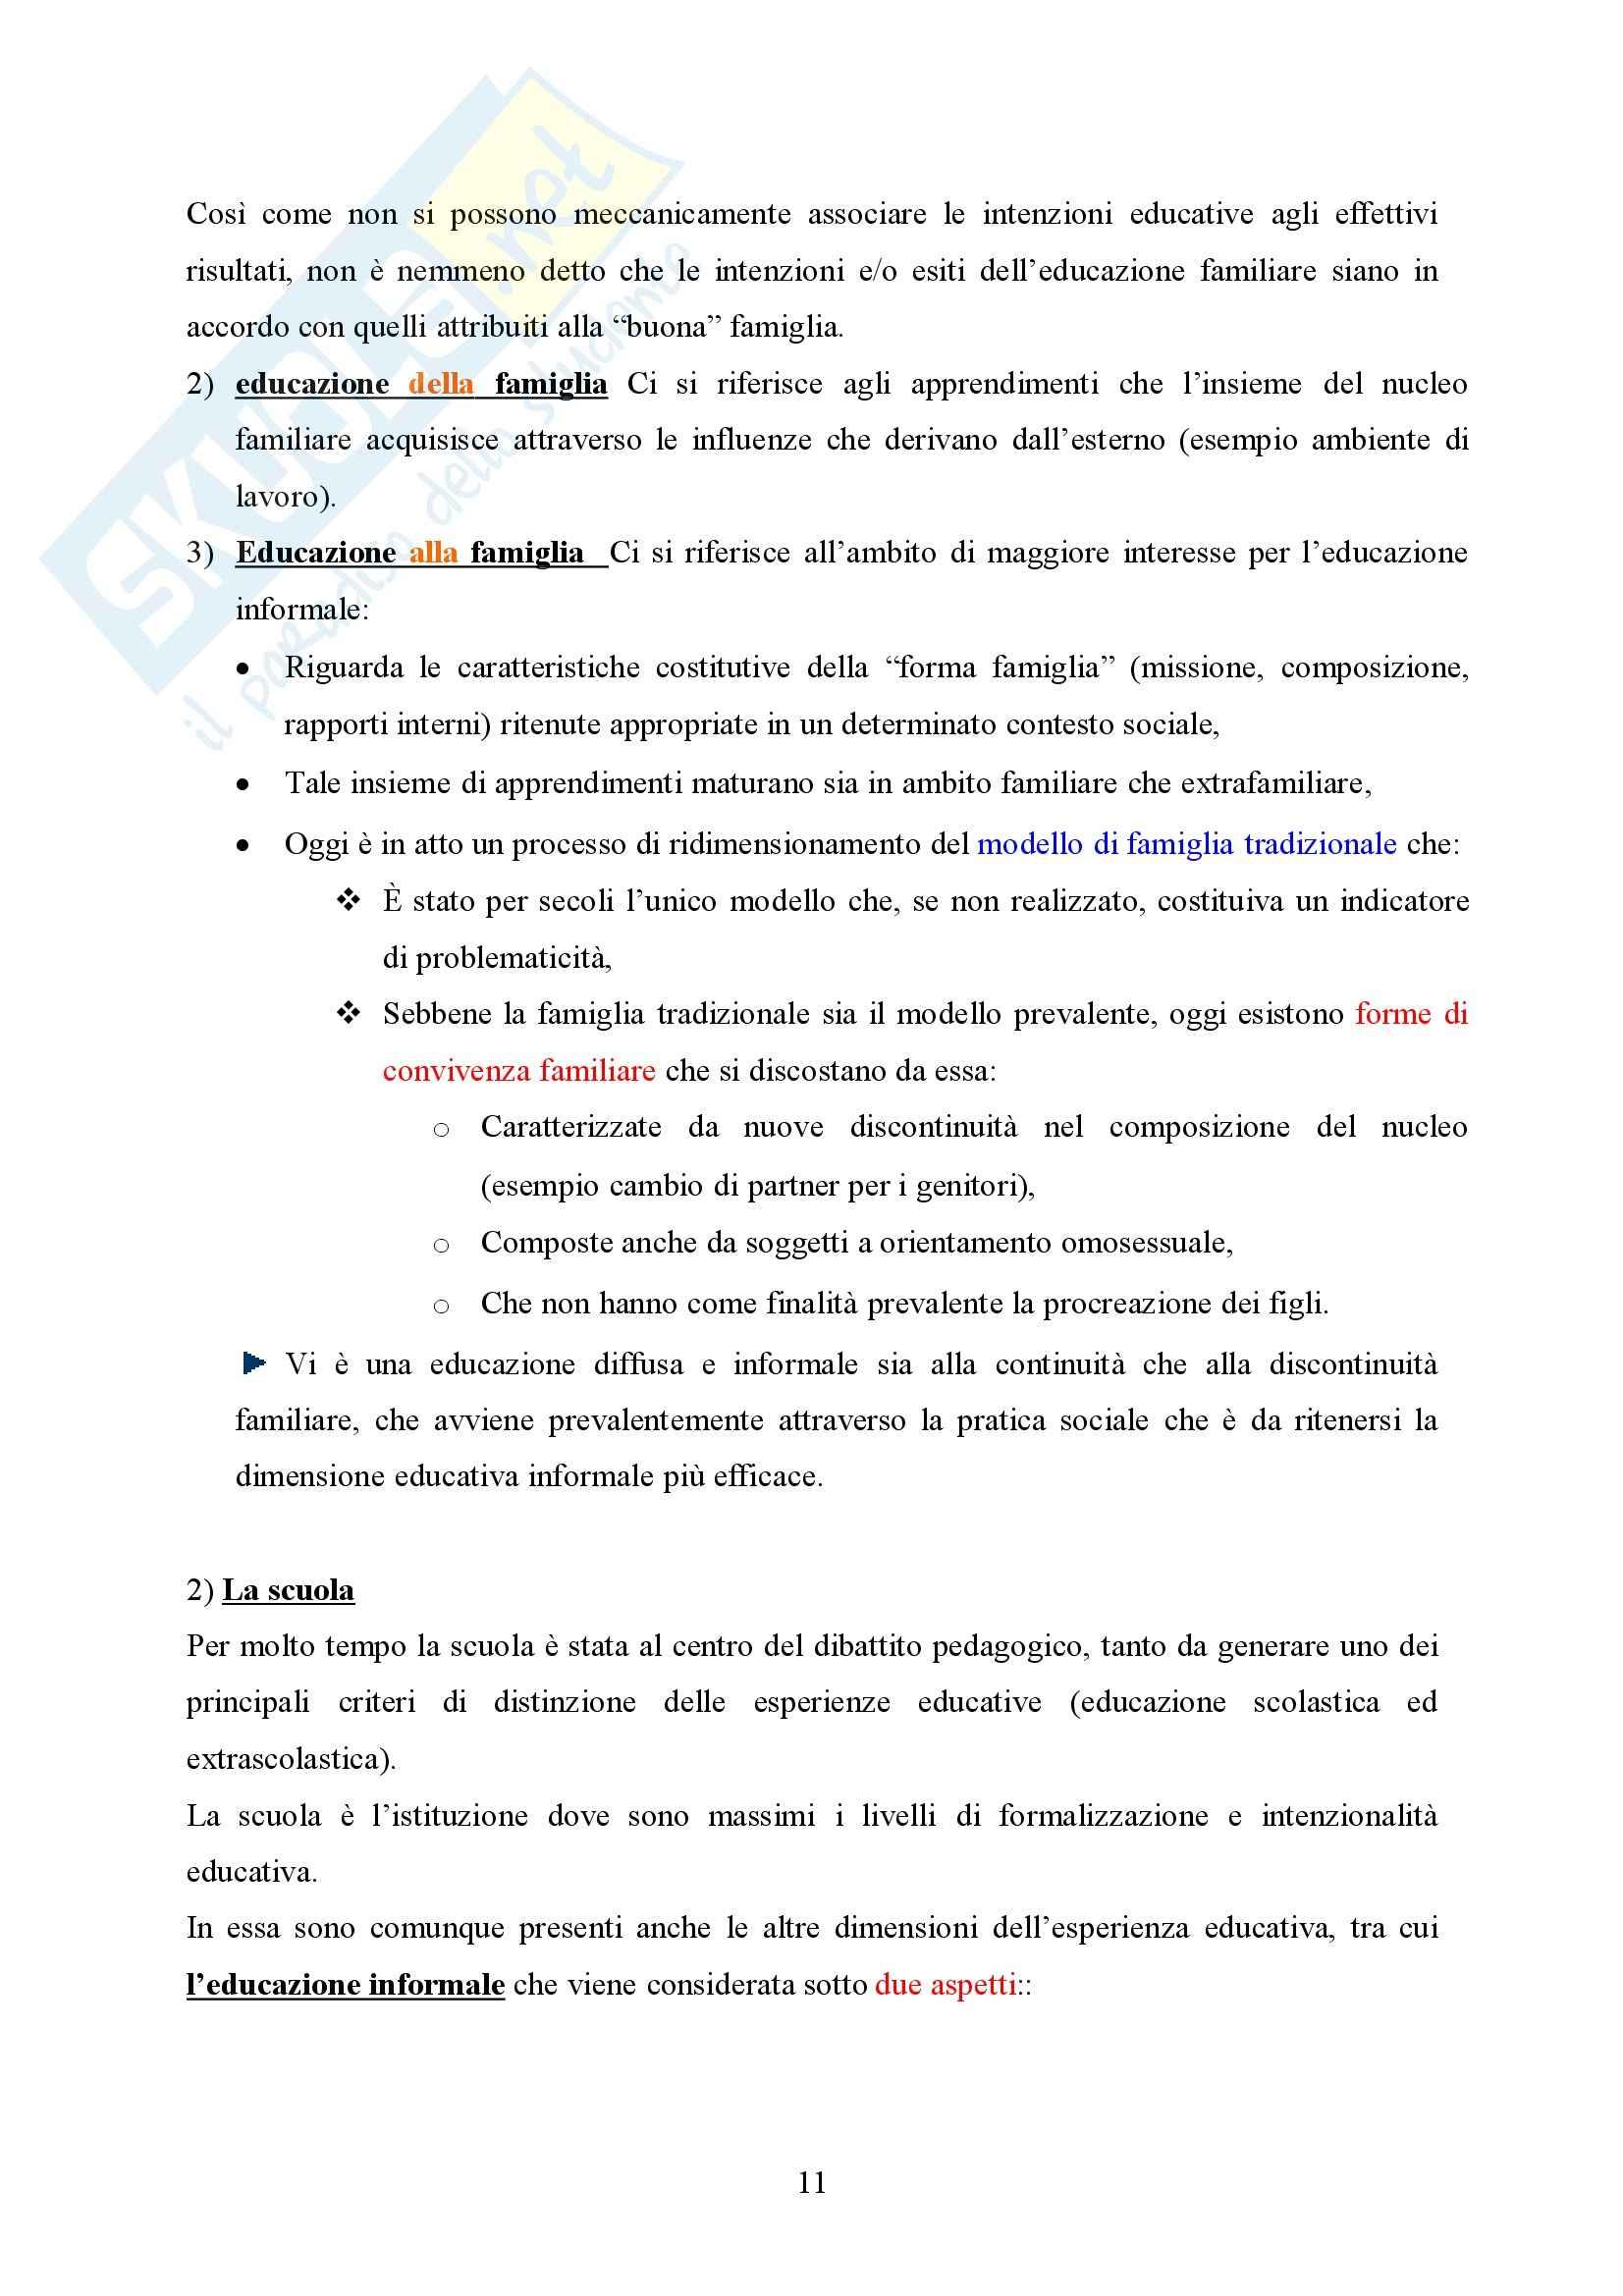 Pedagogia generale – Educazione informale Pag. 11